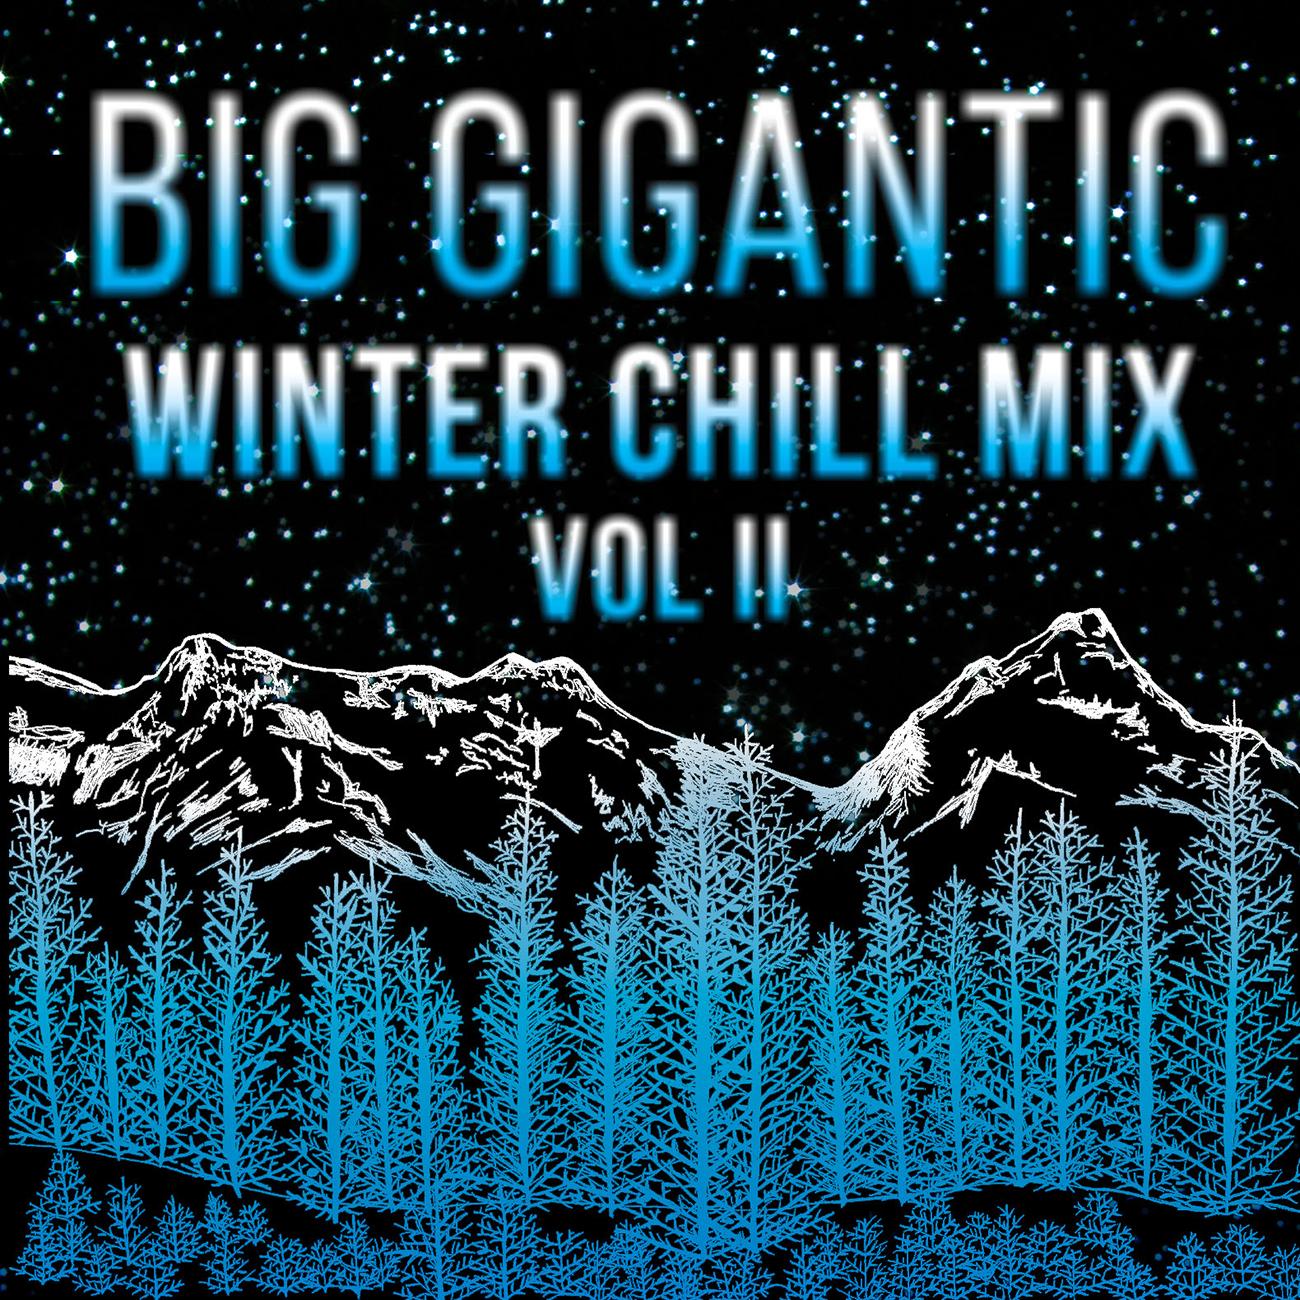 Big Gigantic design for Winter Chill Mix Volume II